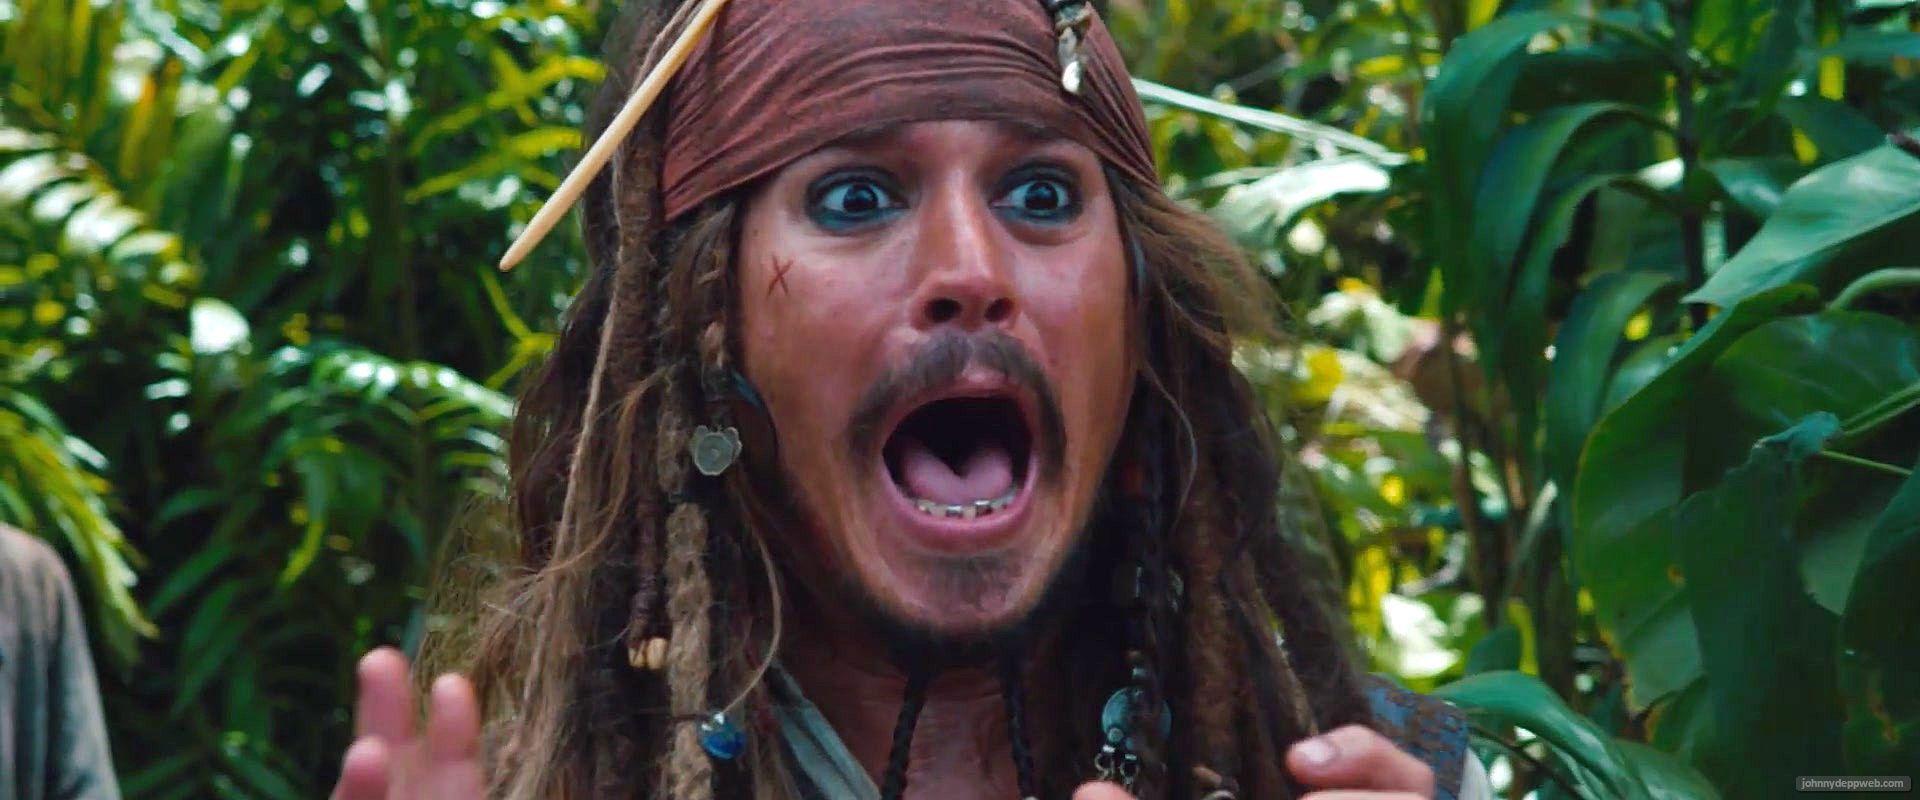 Guns Movies Pirates Caribbean Johnny Depp Actors Captain Jack Sparrow